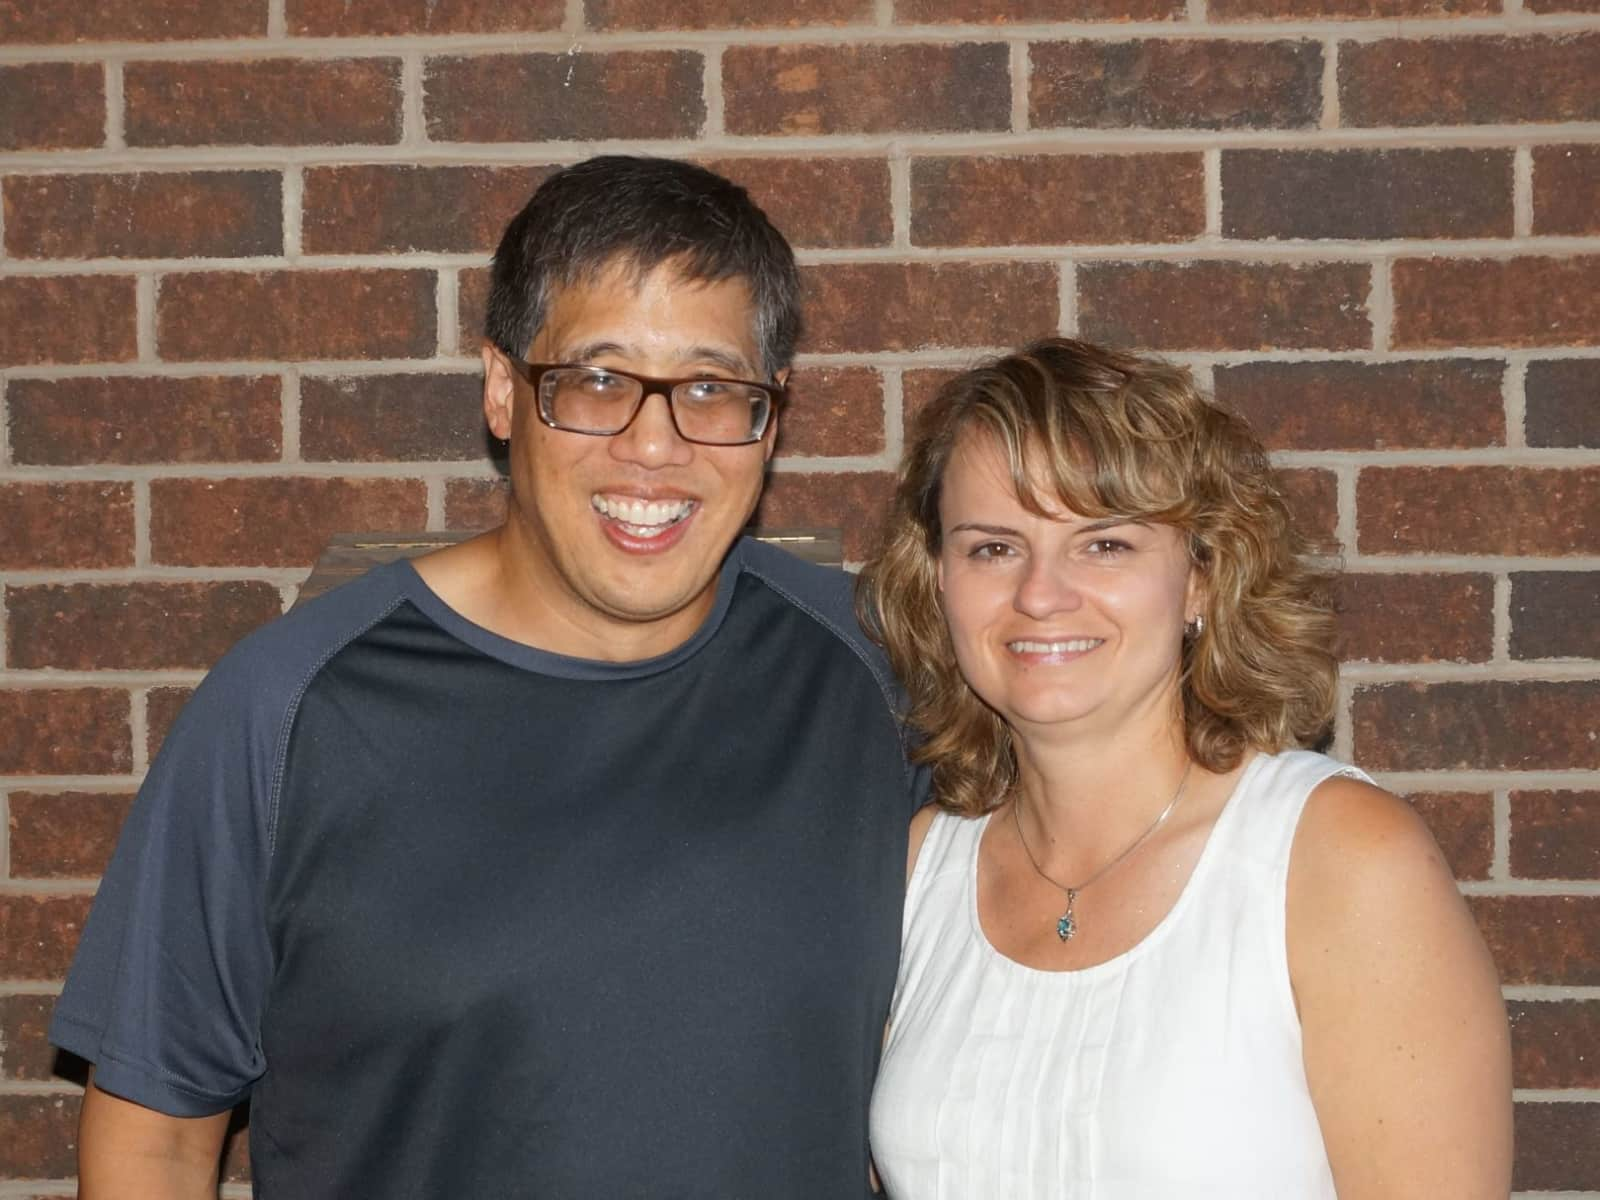 Michael & Rhonda from Oakville, Ontario, Canada